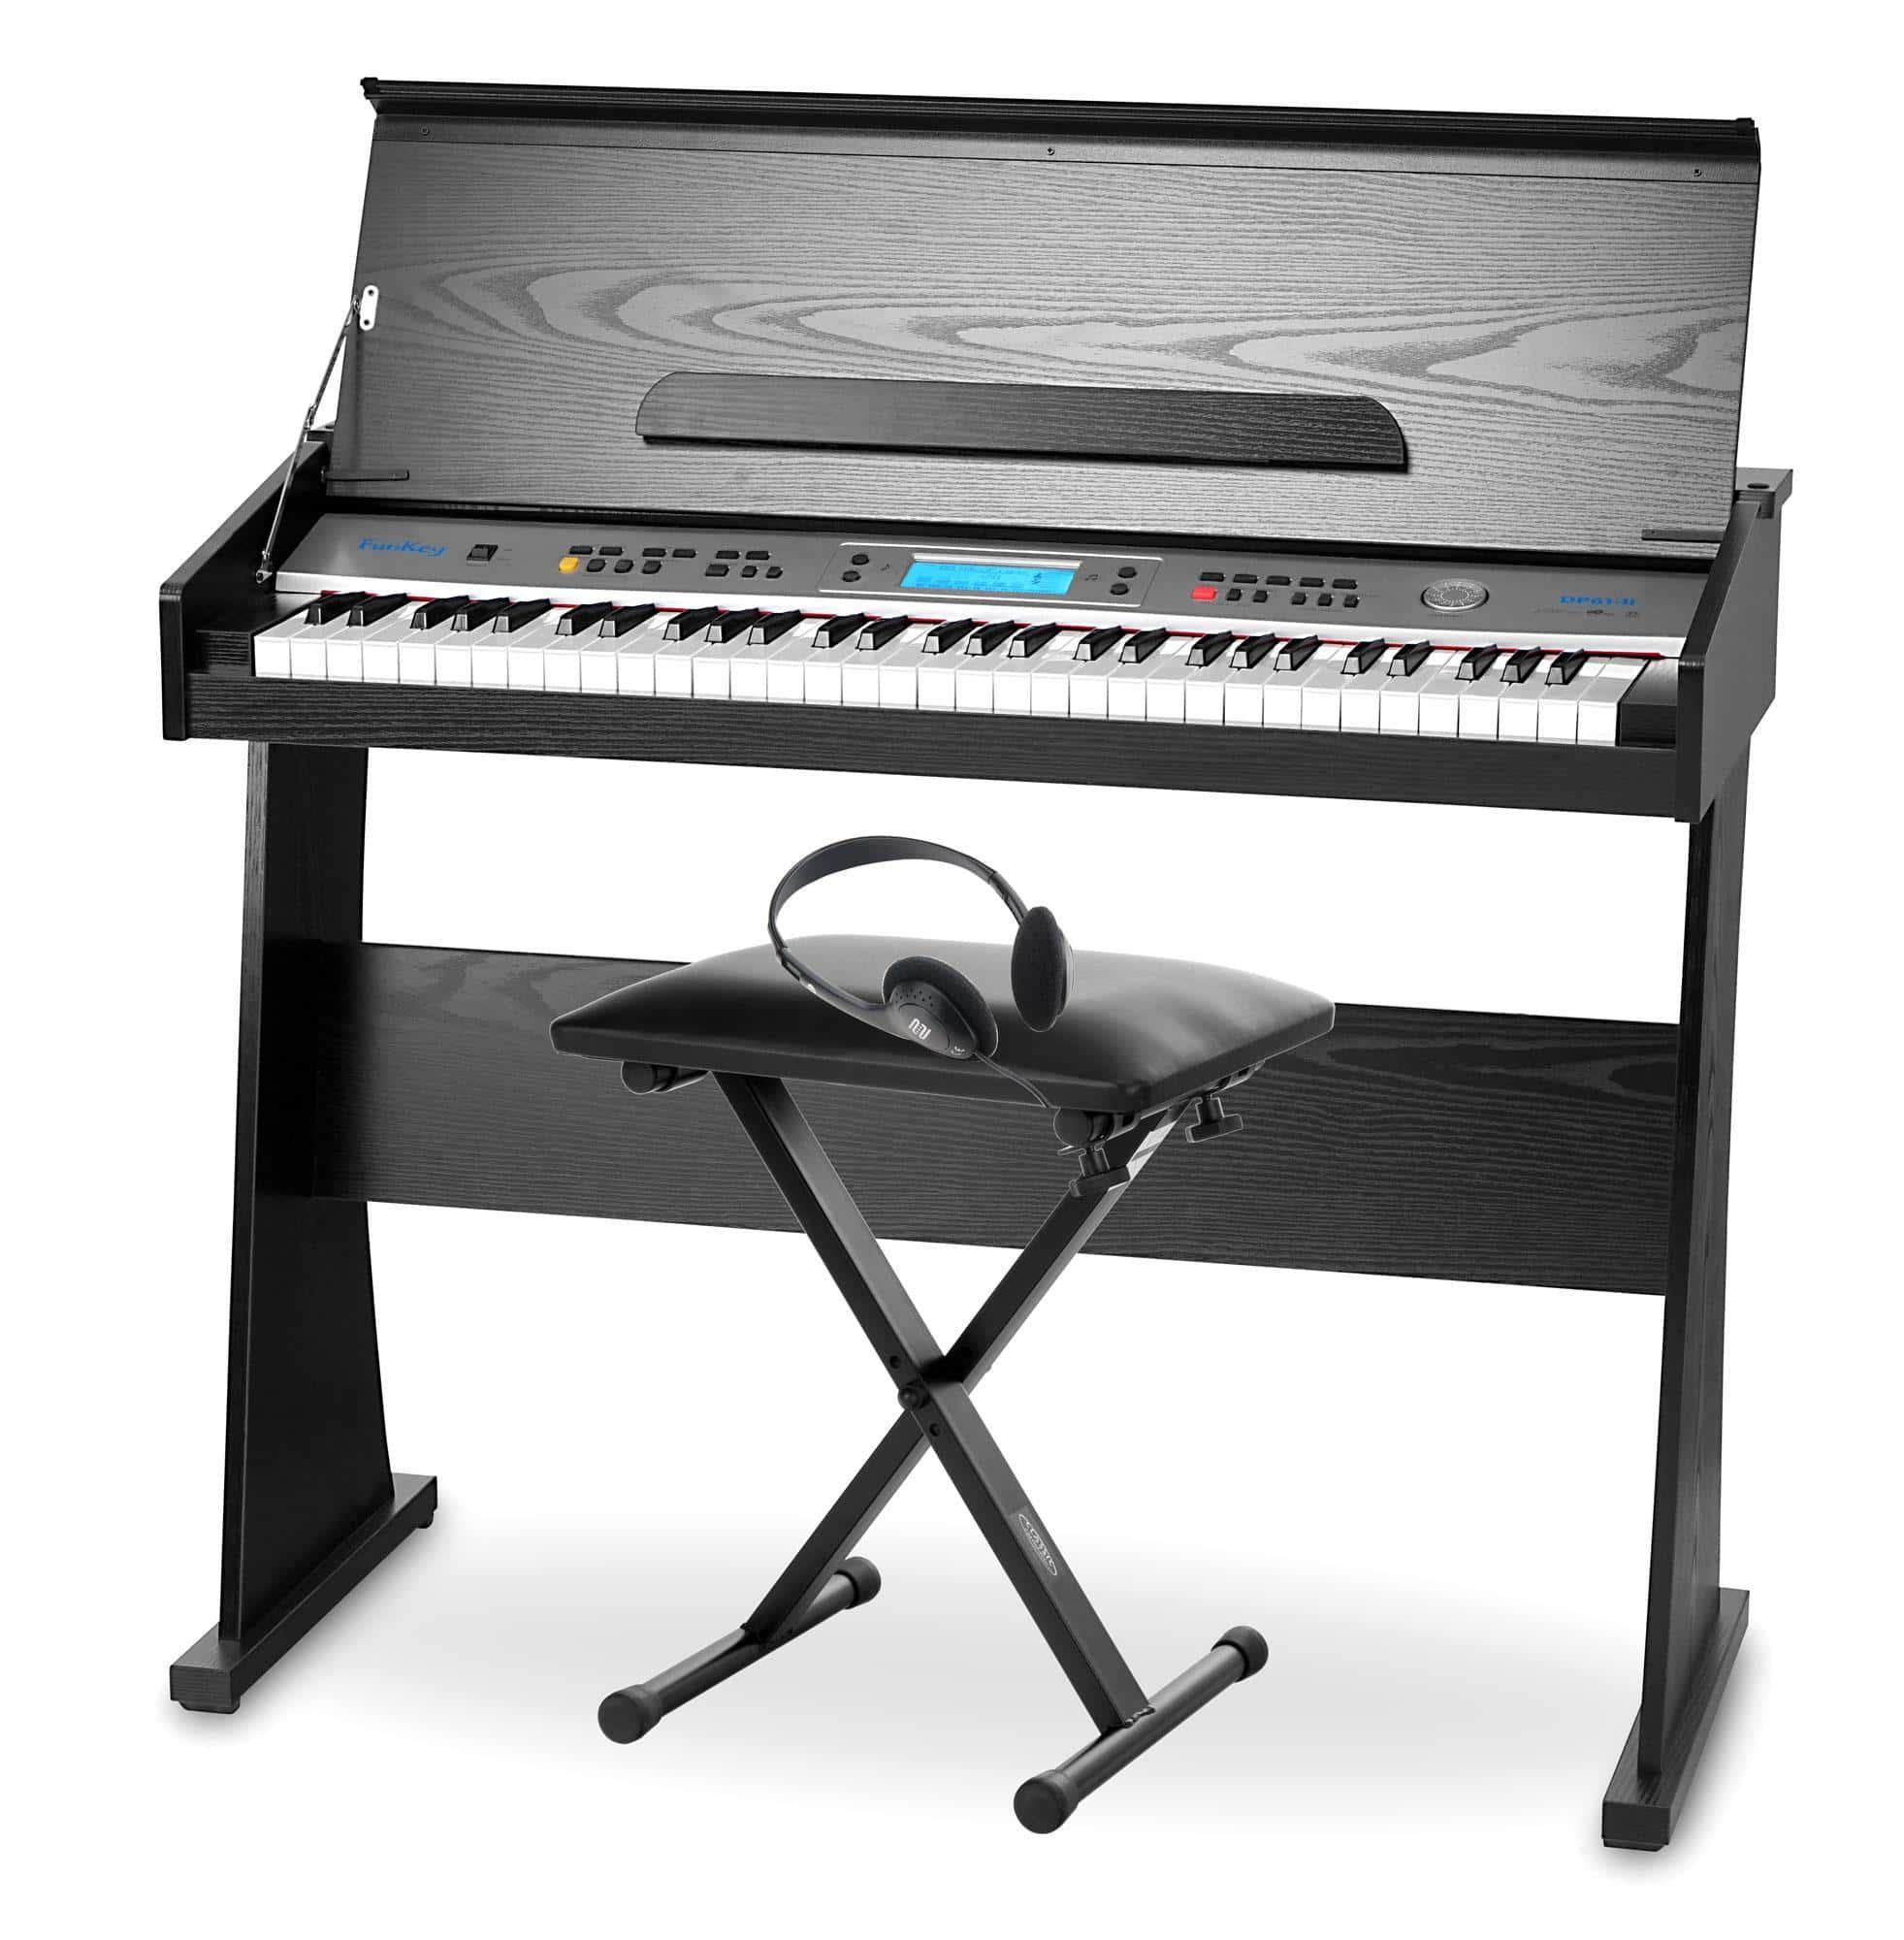 FunKey DP 61 II Keyboard mit 61 Tasten im Digitalpiano Design SET inkl. Bank Kopfhörer